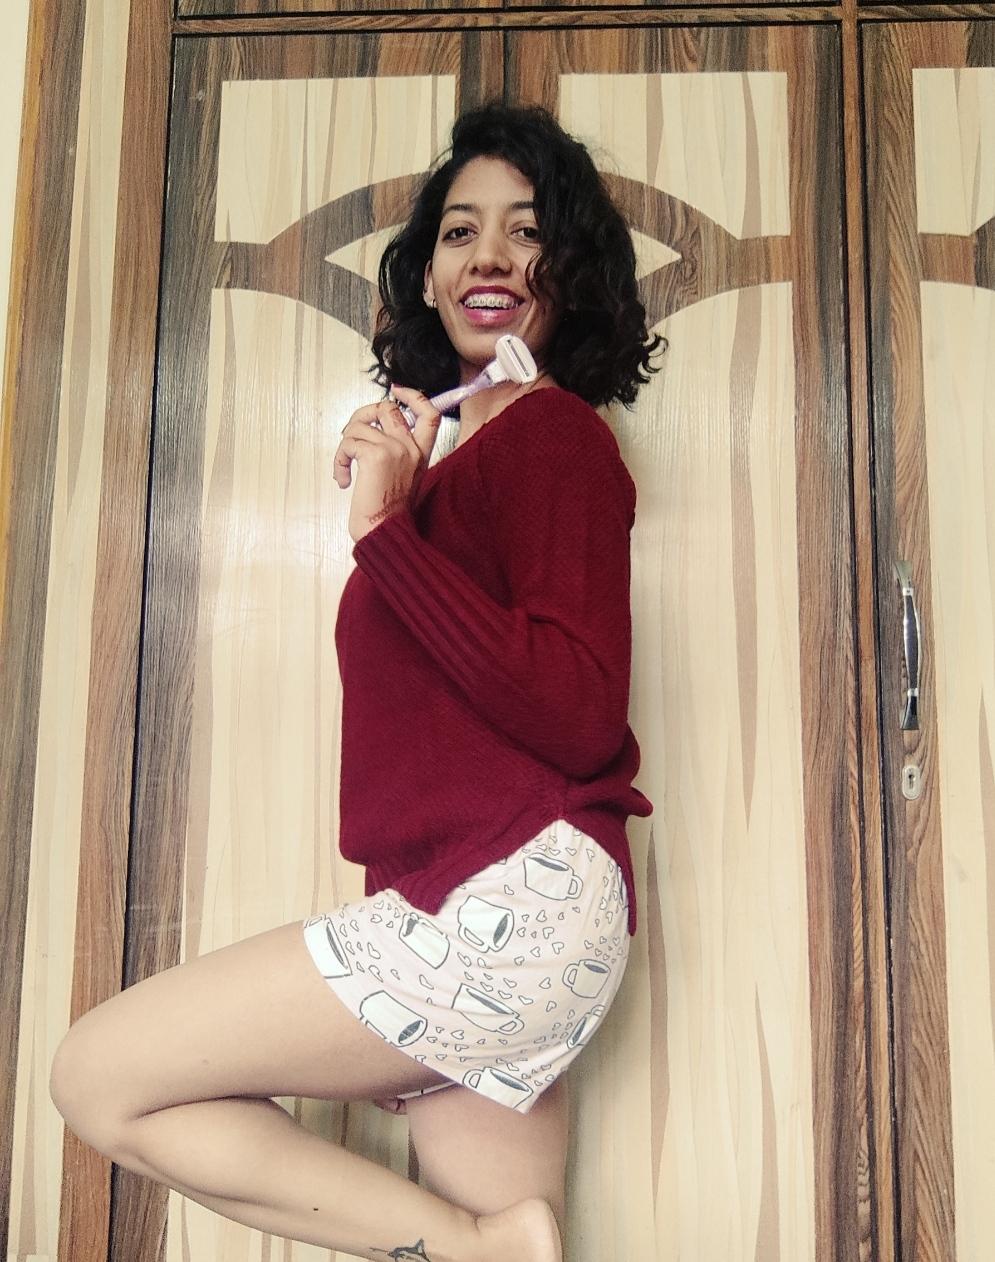 Gillette Venus Breeze Razor-Easy Breezy Perfect Skin!-By hiphopgirl-2